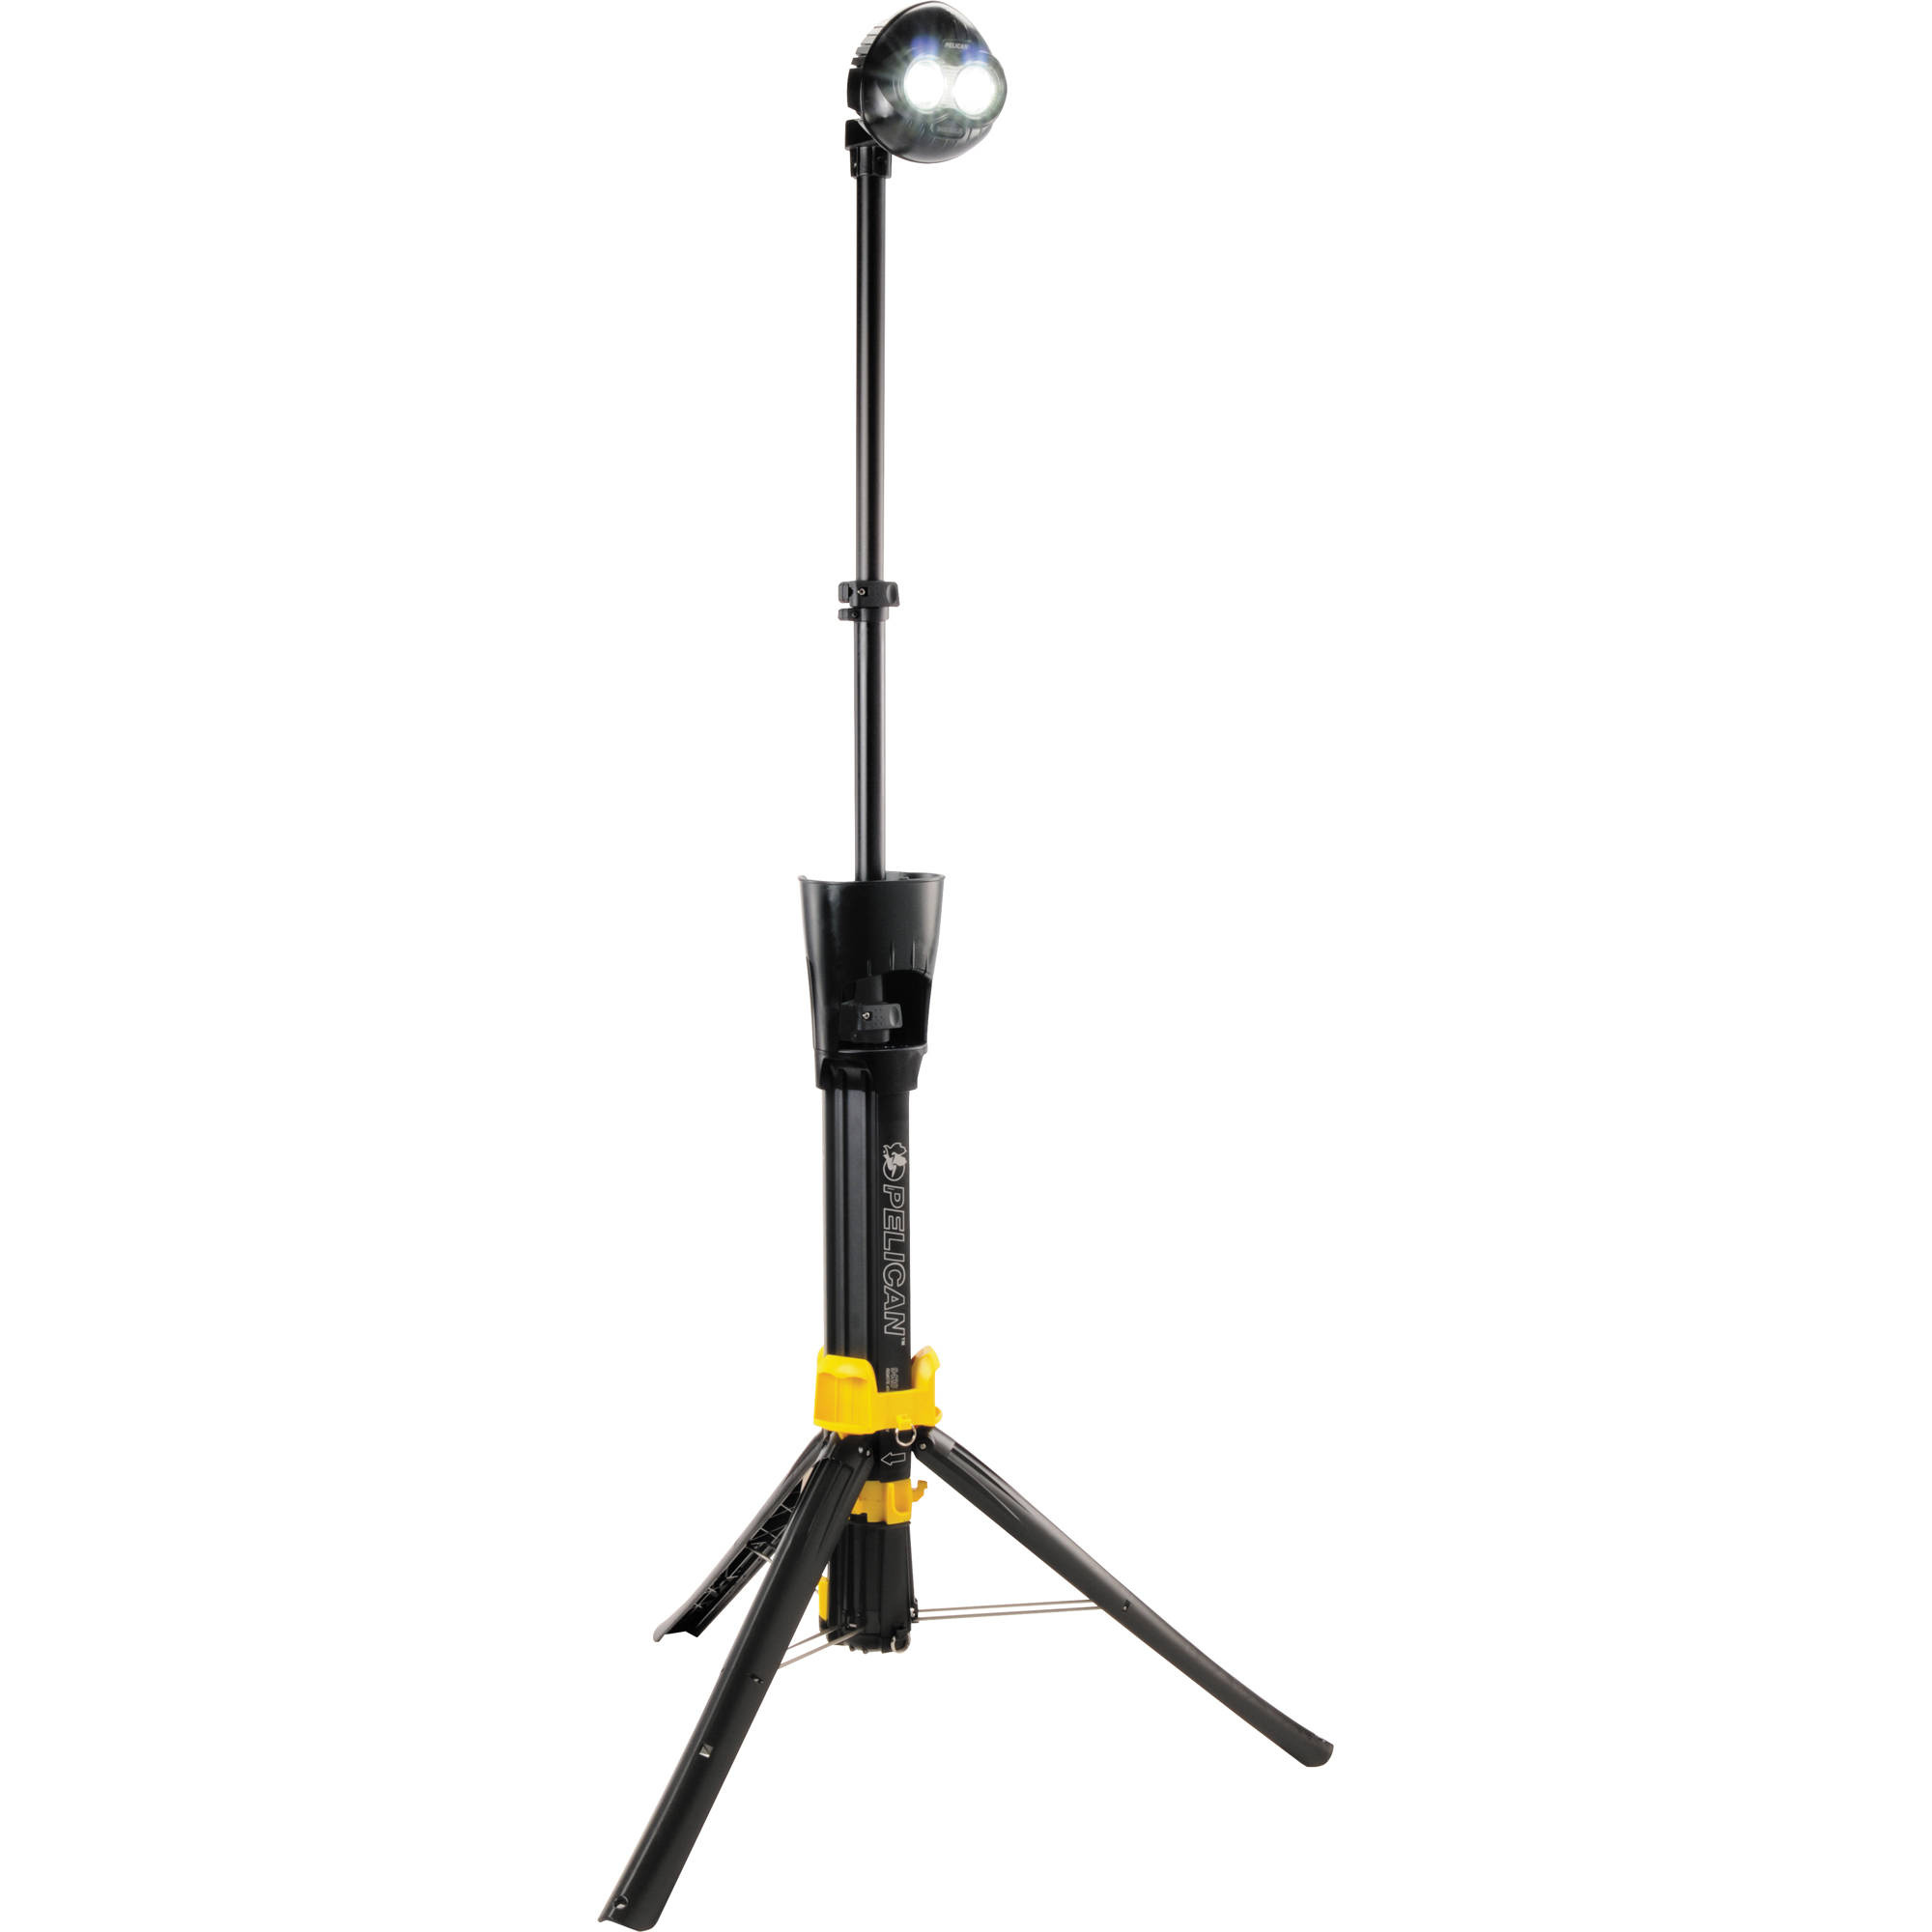 Pelican 9420 ProGear LED Work Light - Black